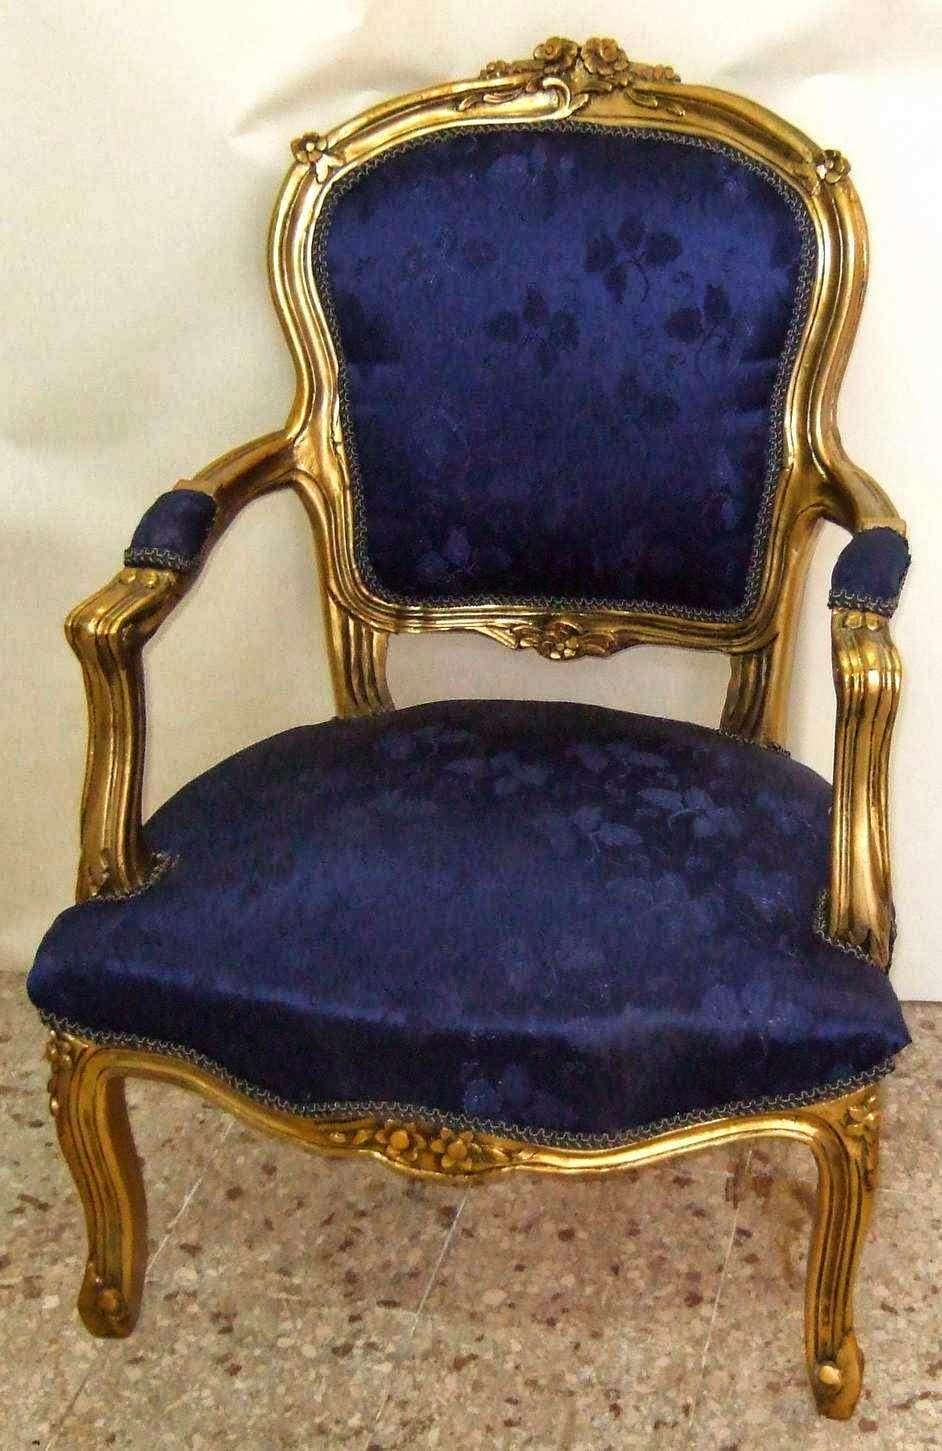 Furniture Francais - furniture store  | Photo 2 of 5 | Address: 93 Plaistow Rd, Plaistow, NH 03865, USA | Phone: (603) 686-2623